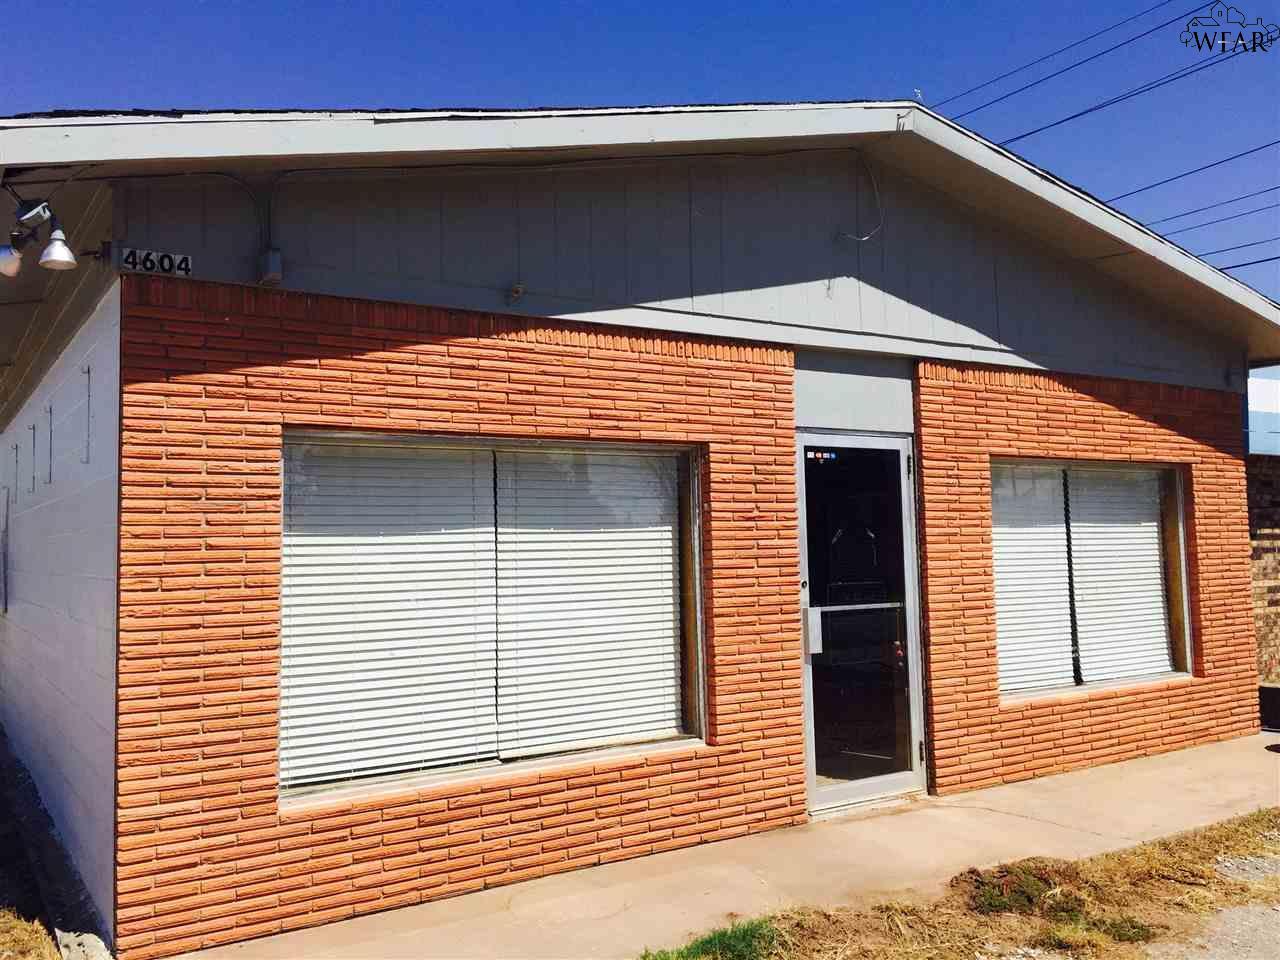 4604 JOHNSON ROAD, Wichita Falls, TX 76310